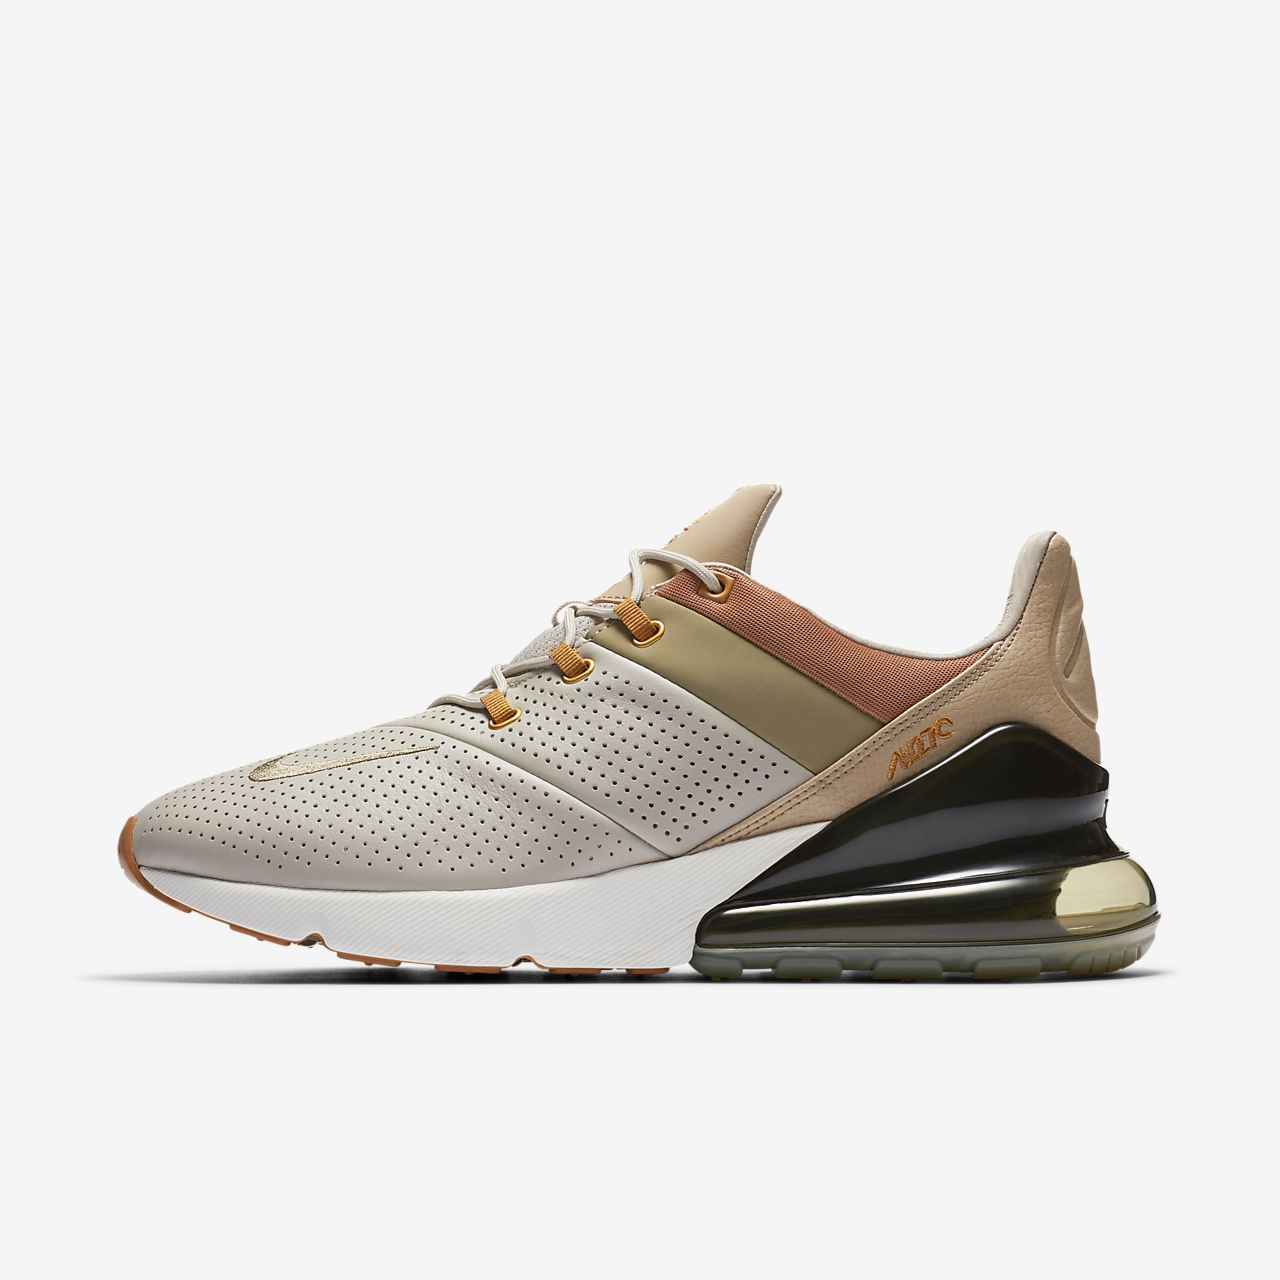 scarpe nike uomo 2018 air max 270